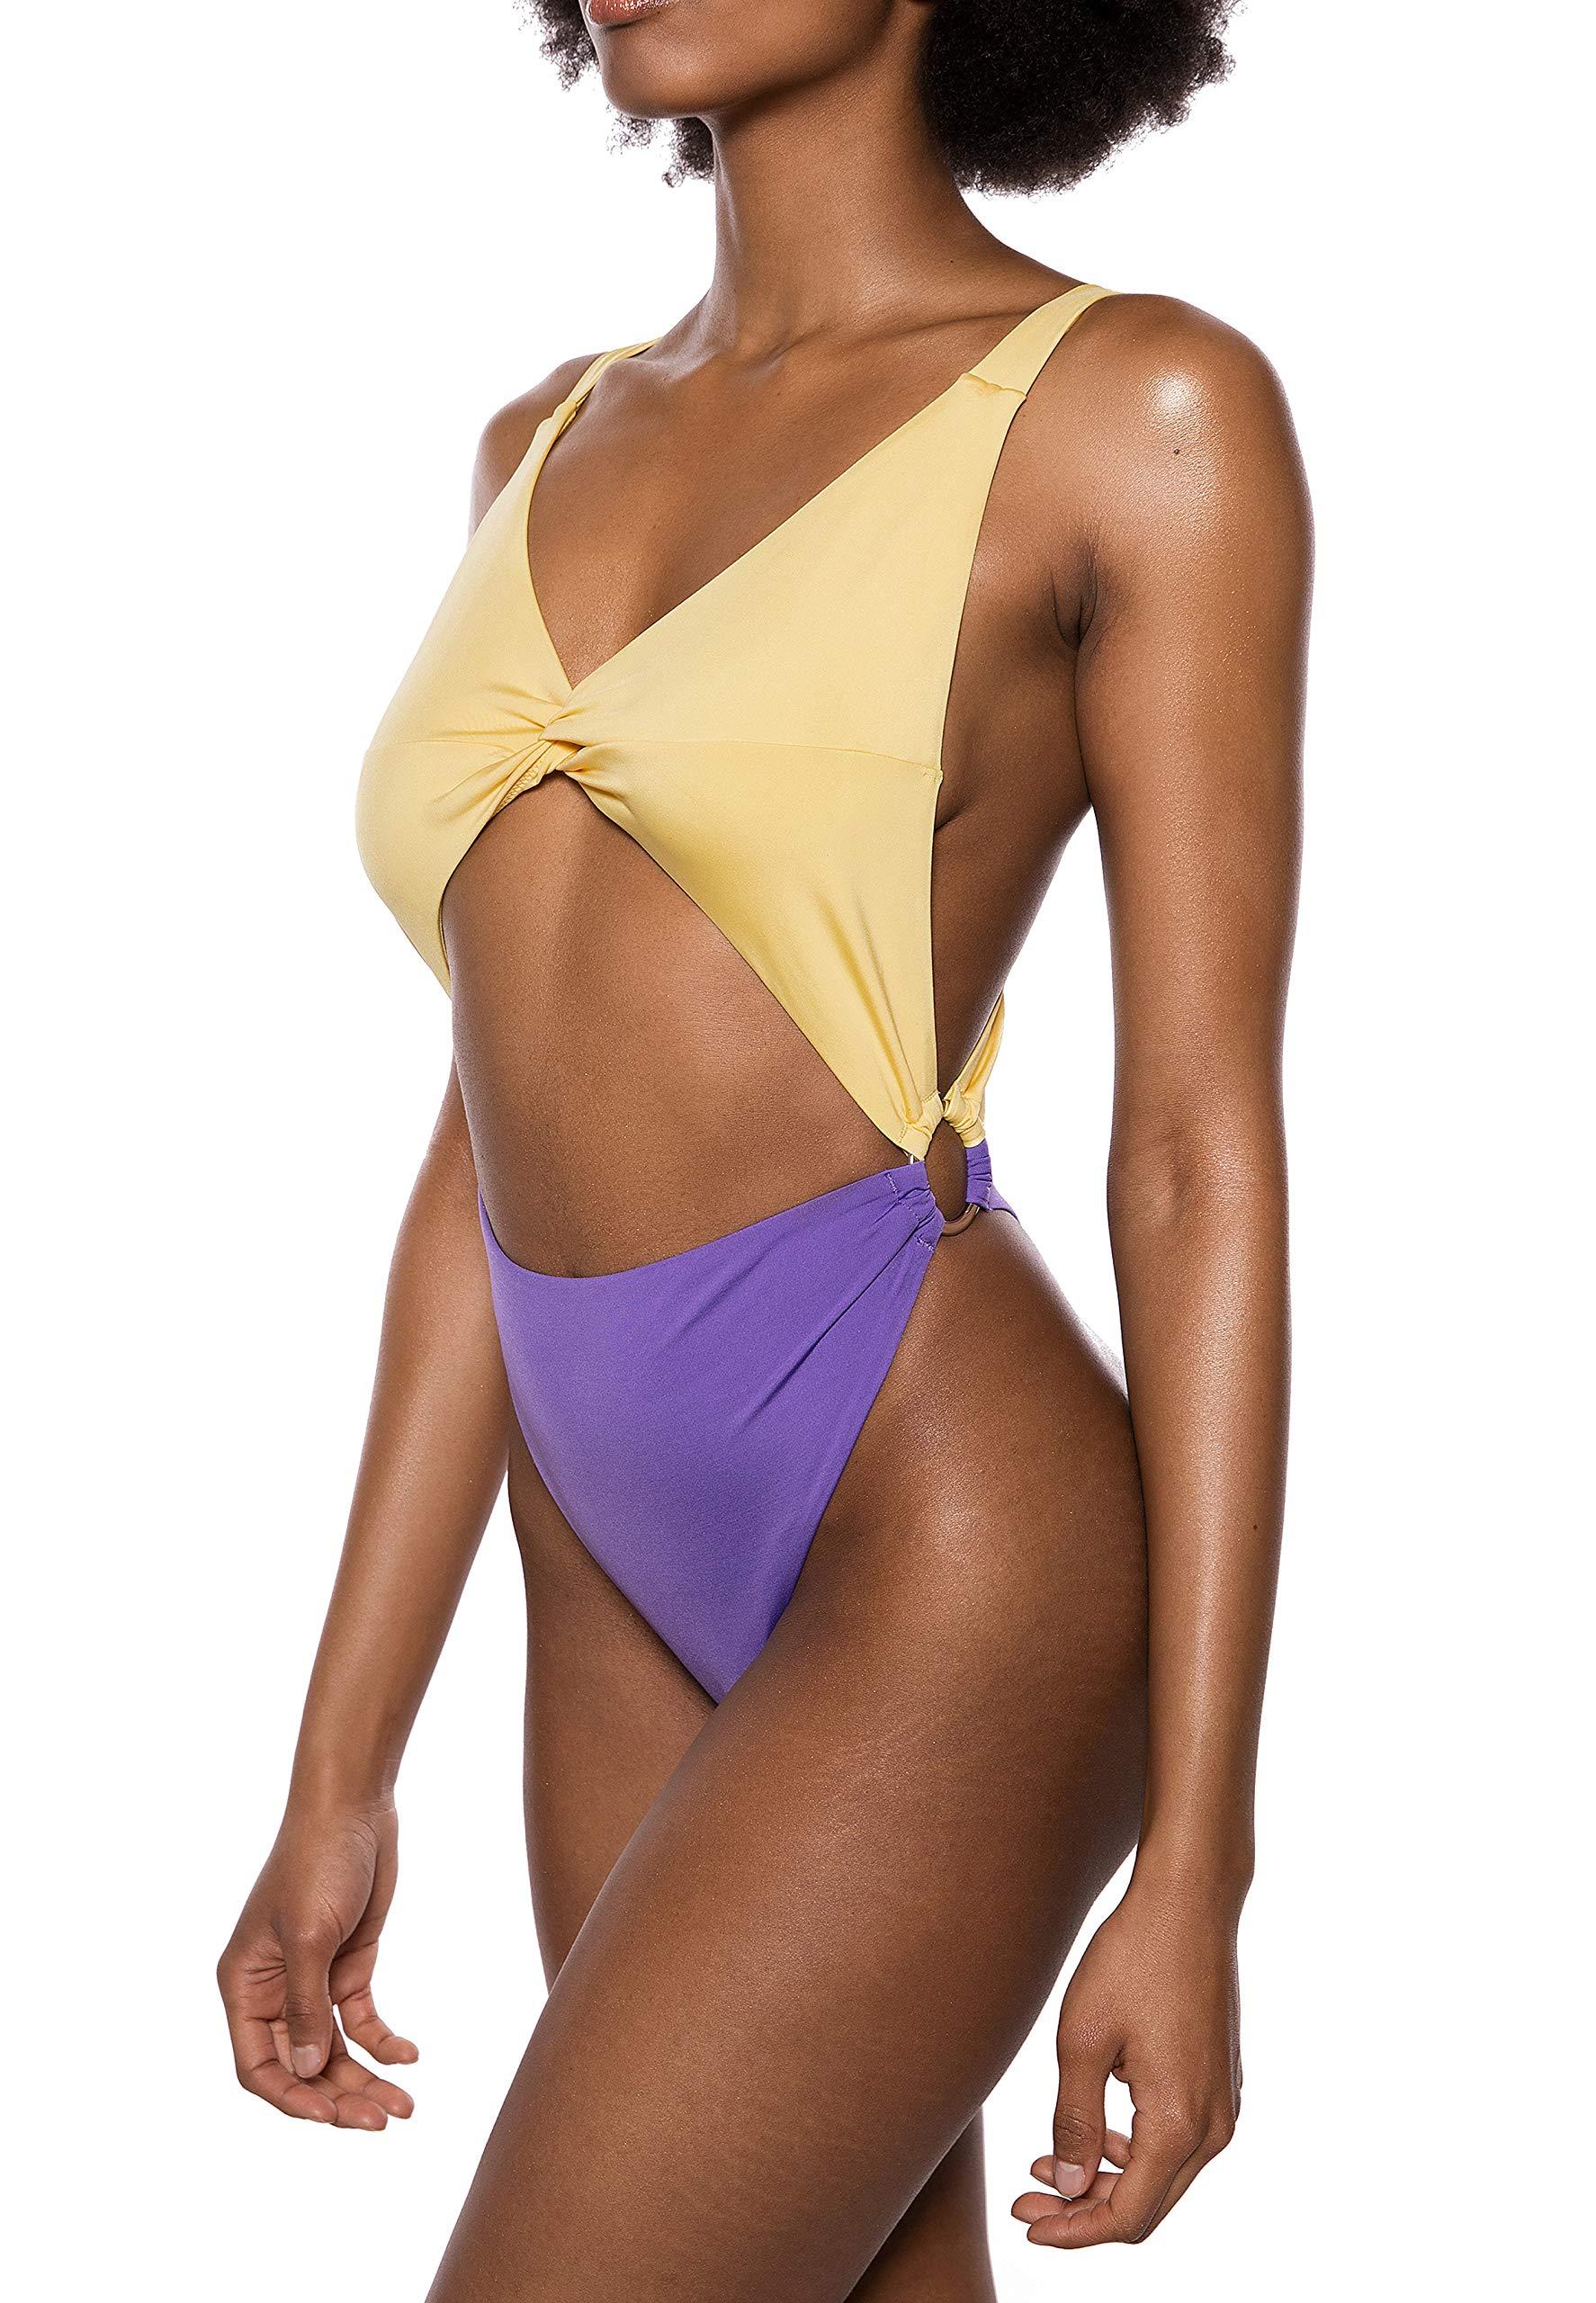 Maillot Revel Fabricant34Femme Une Swimsuit purple Twist De PièceMulticoloreyellow 36258taille Ivy Front 7fgyYb6